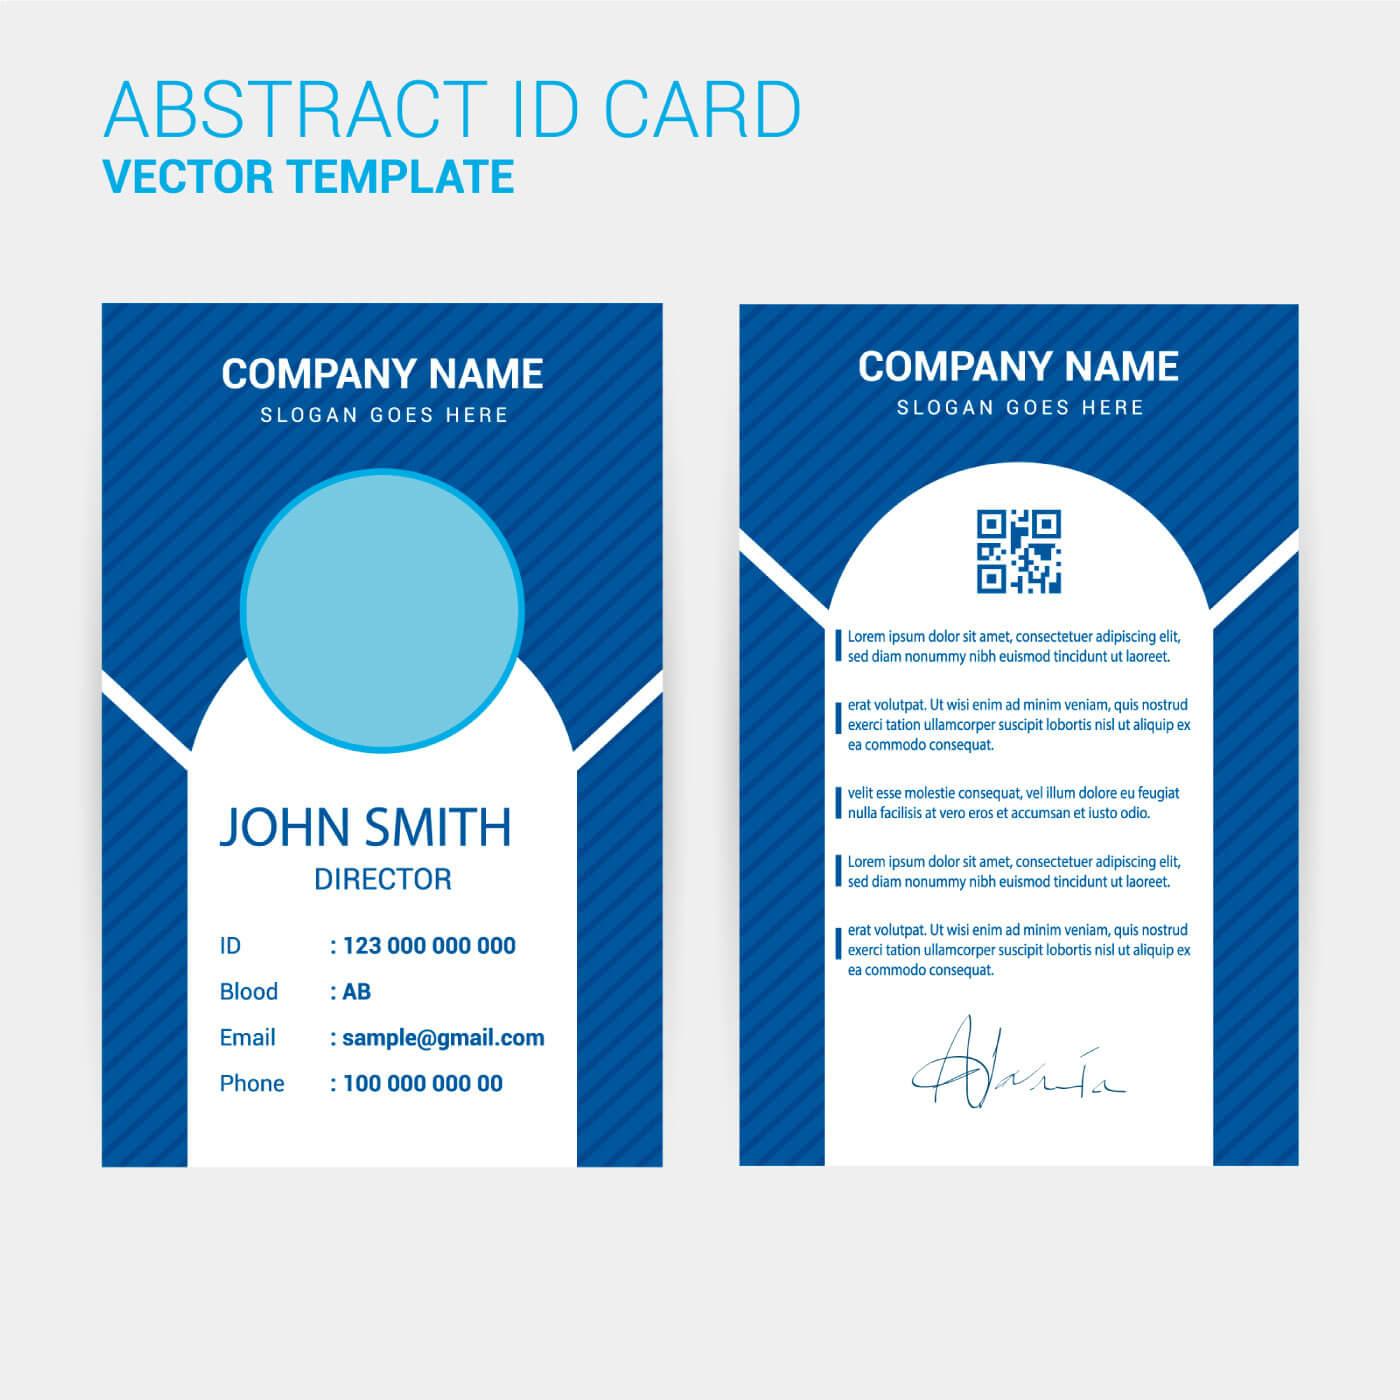 Id Card Design Template - Download Free Vectors, Clipart Regarding Spy Id Card Template